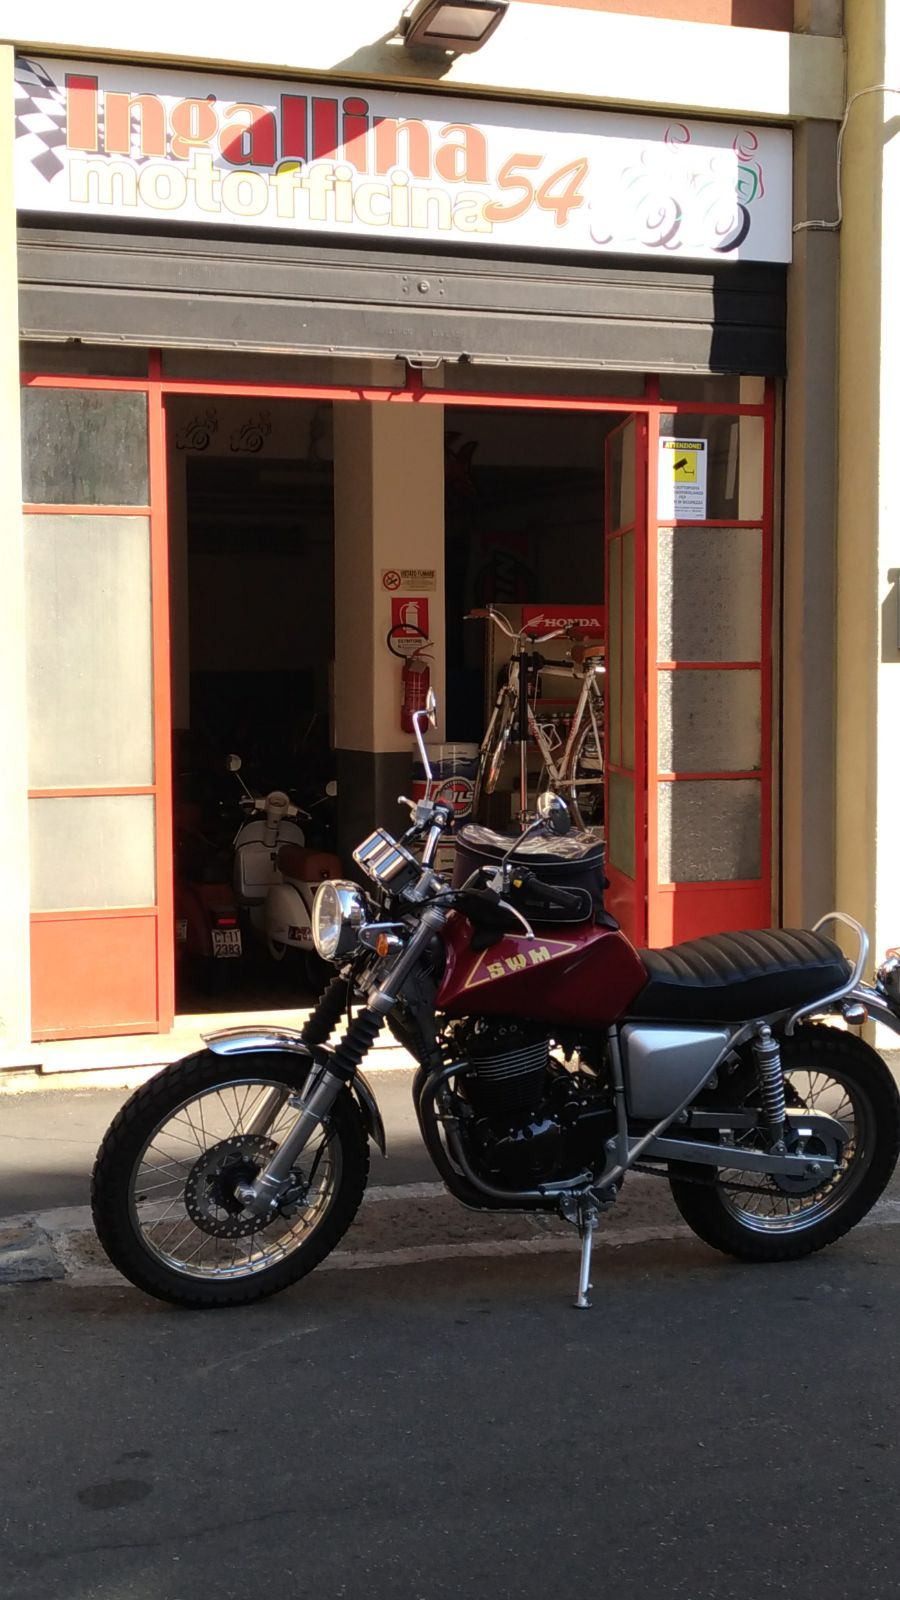 Moto Esposizione Motofficina Ct